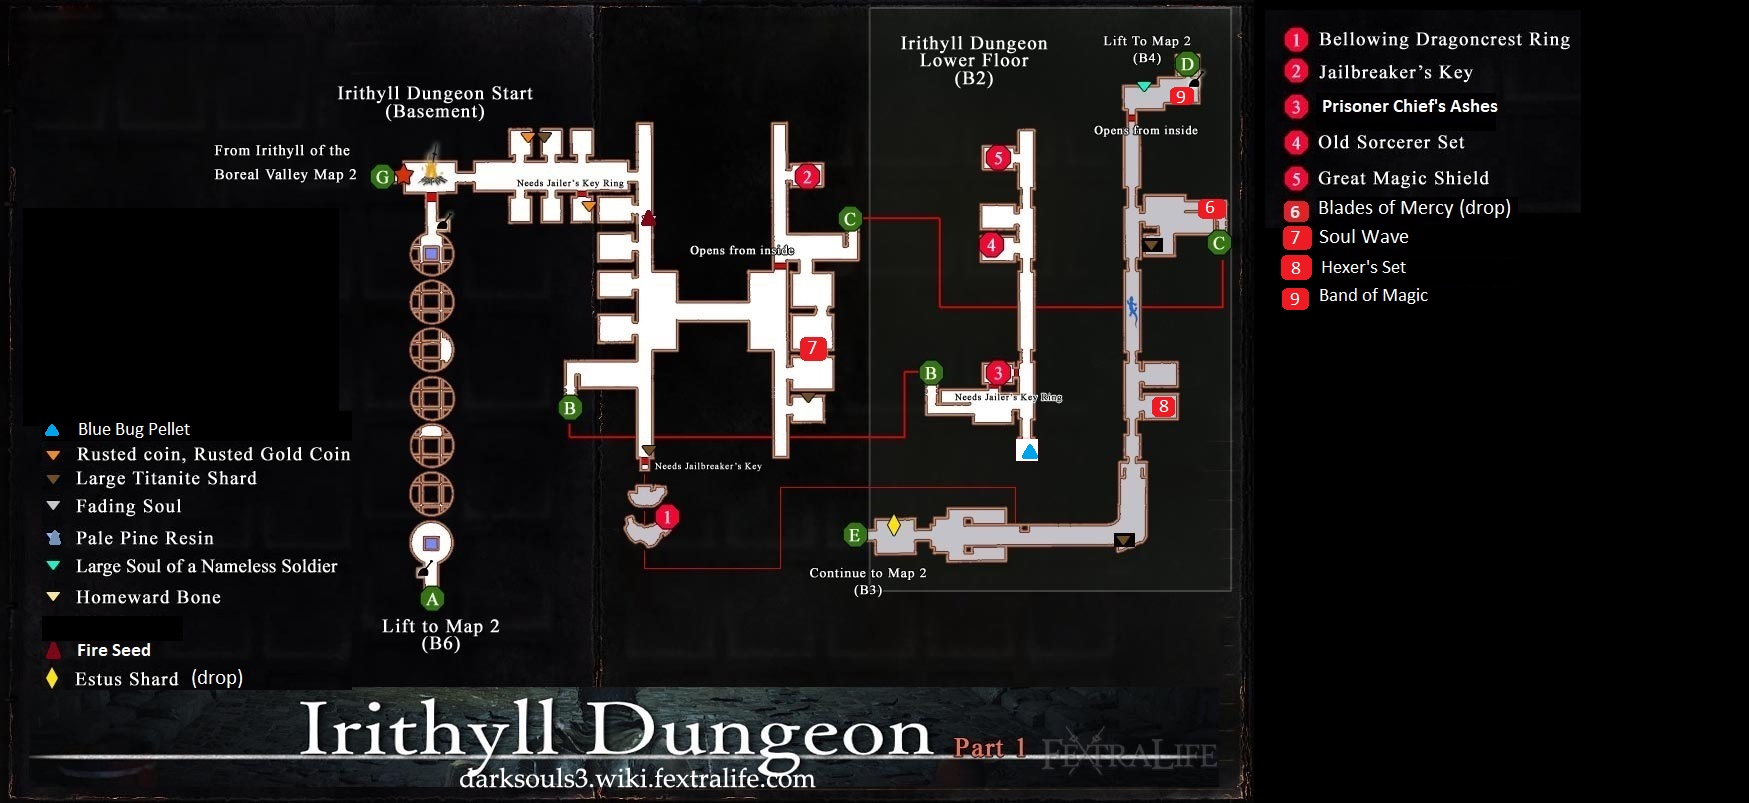 irithyll_dungeon_map1.jpg